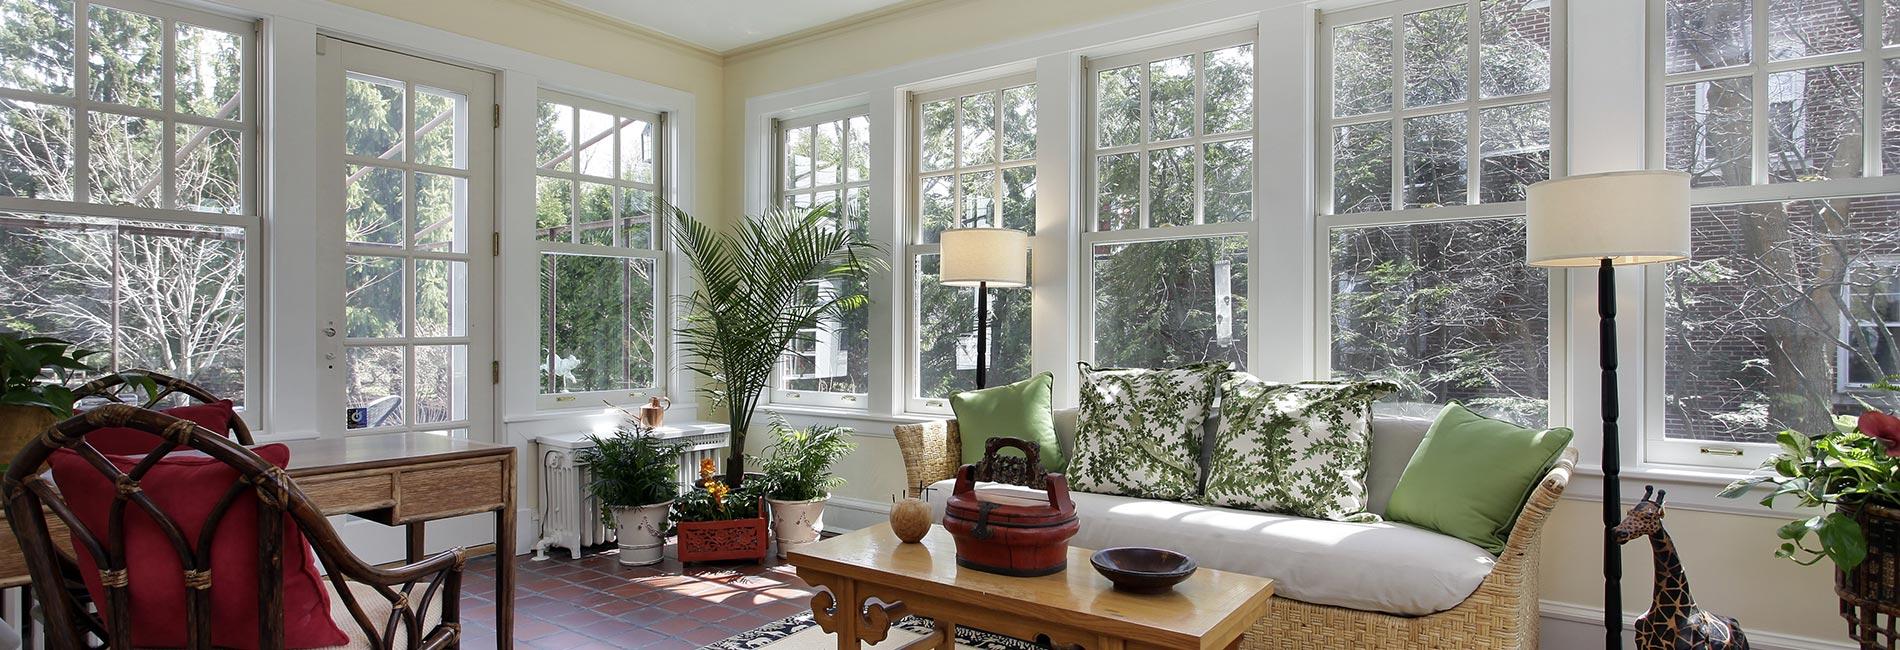 conservatory and sunroom